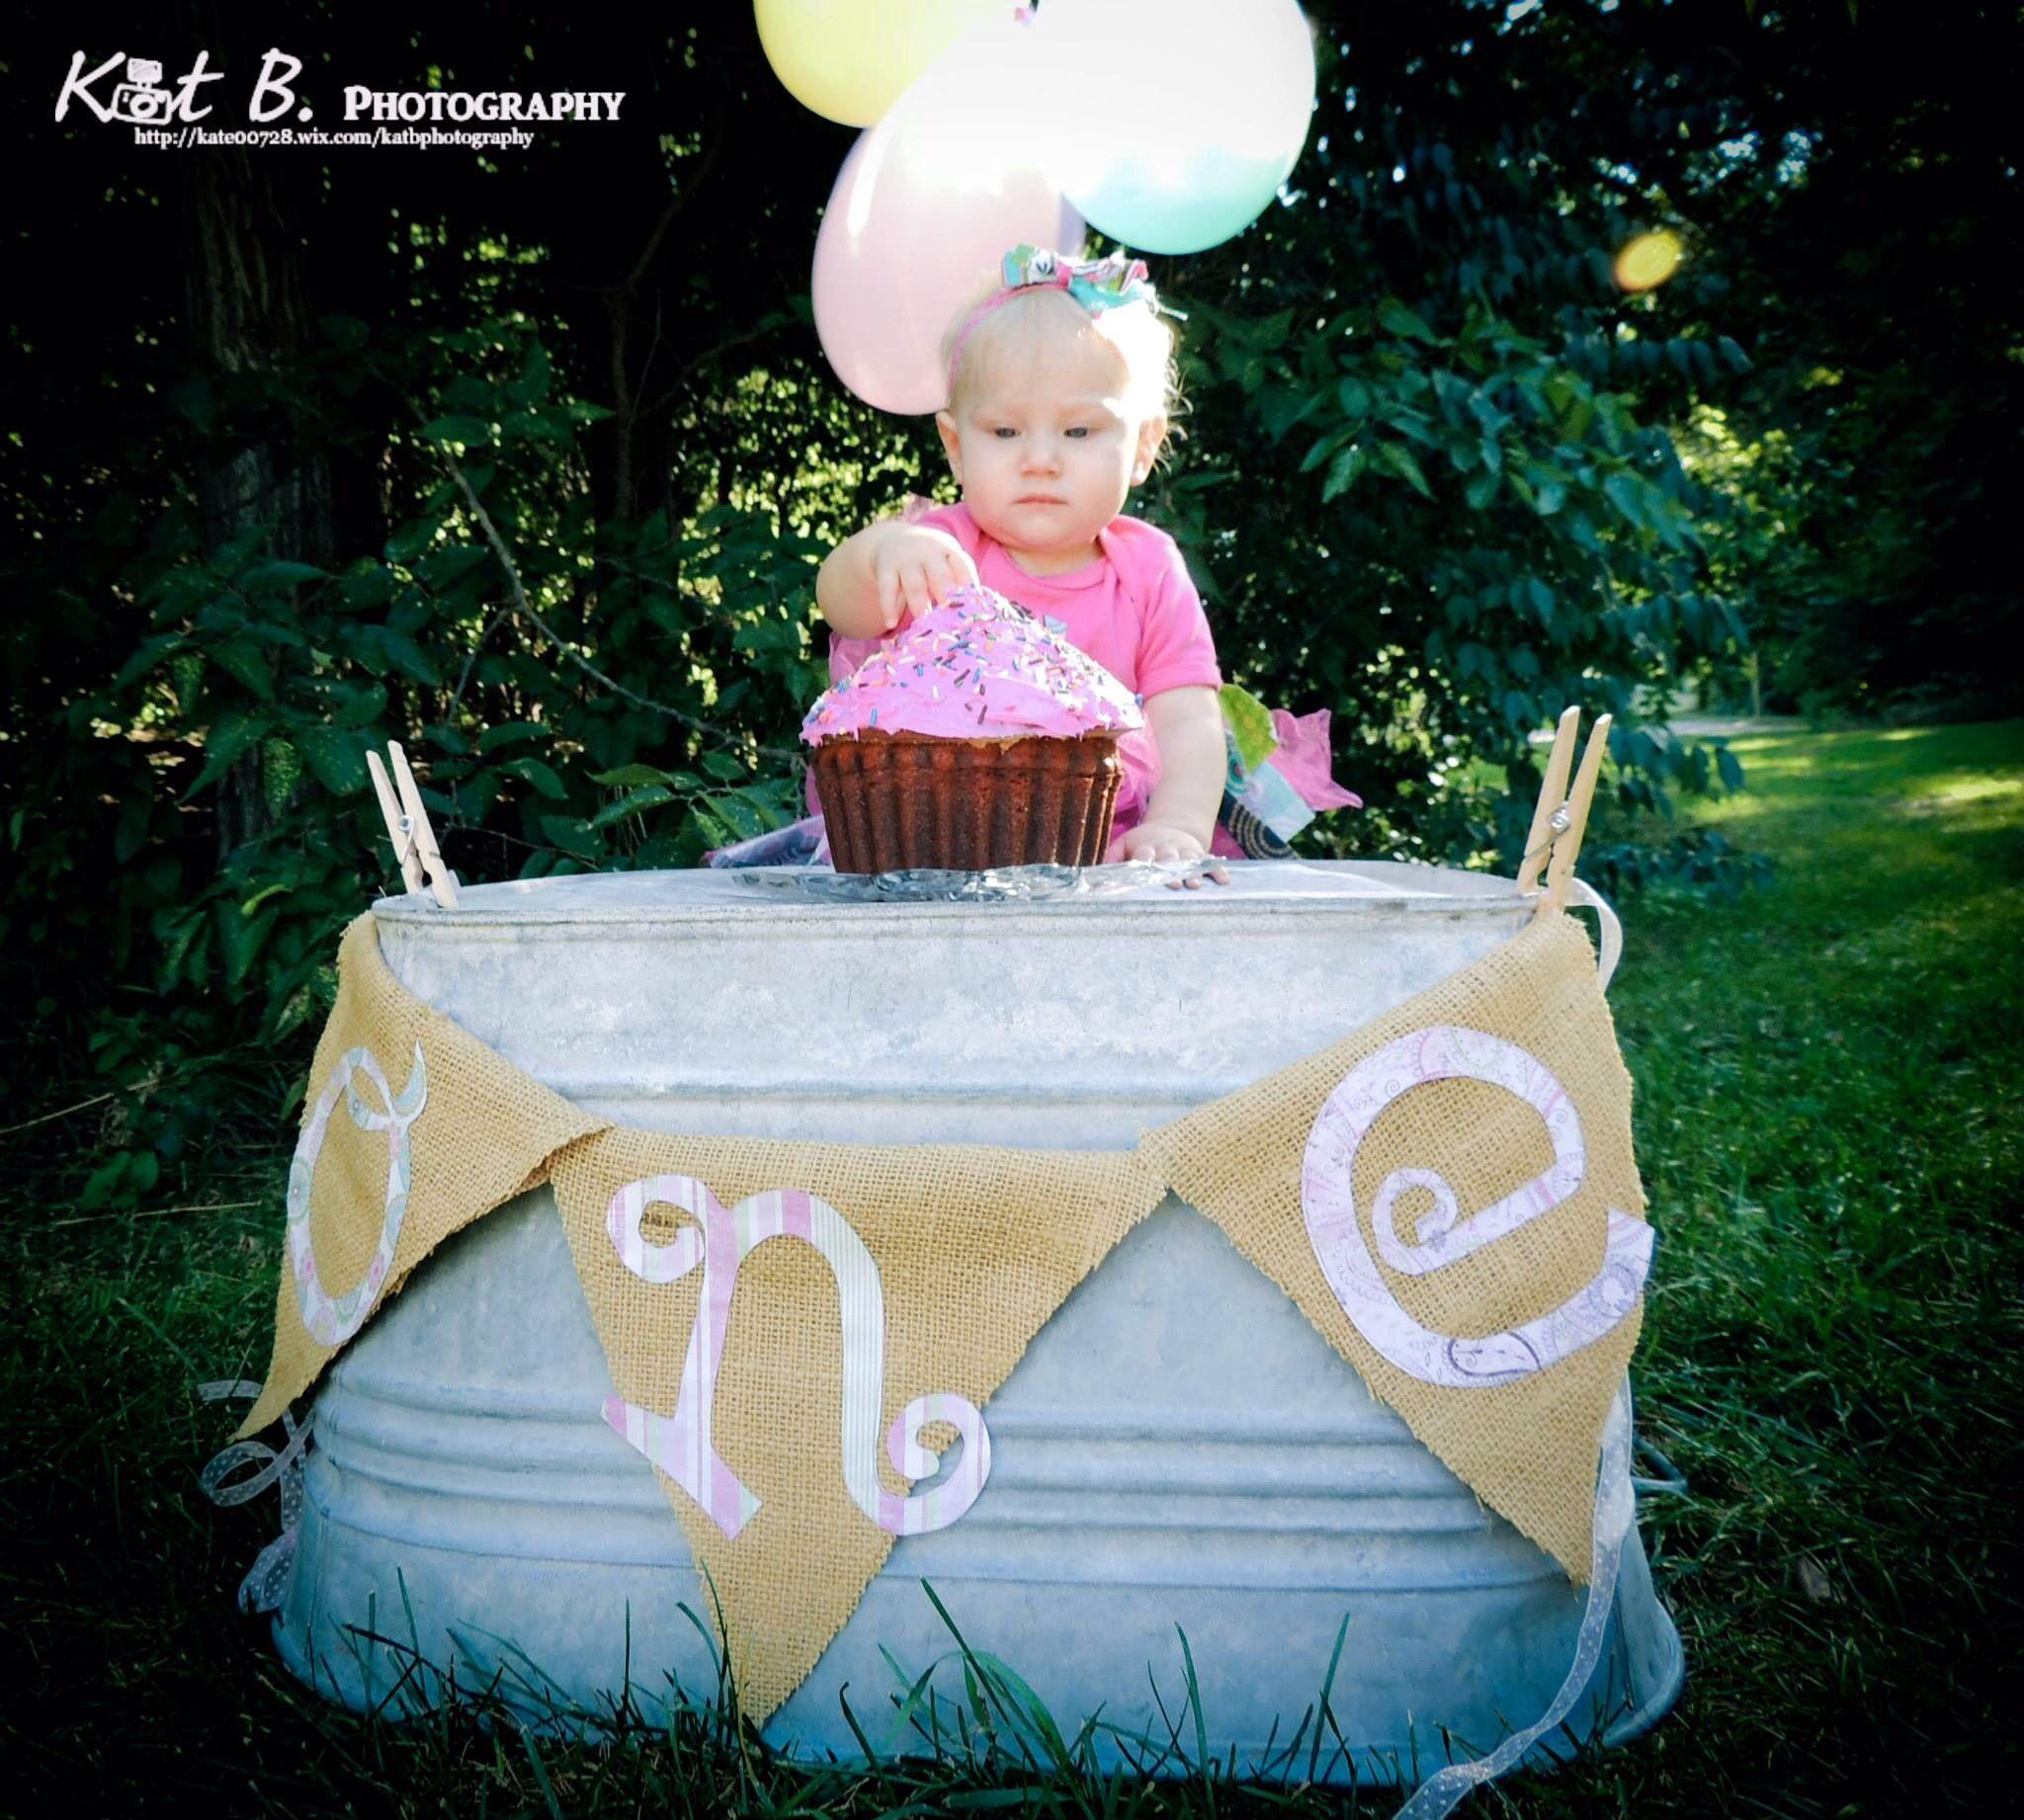 One year old birthdays. Kat B Photography